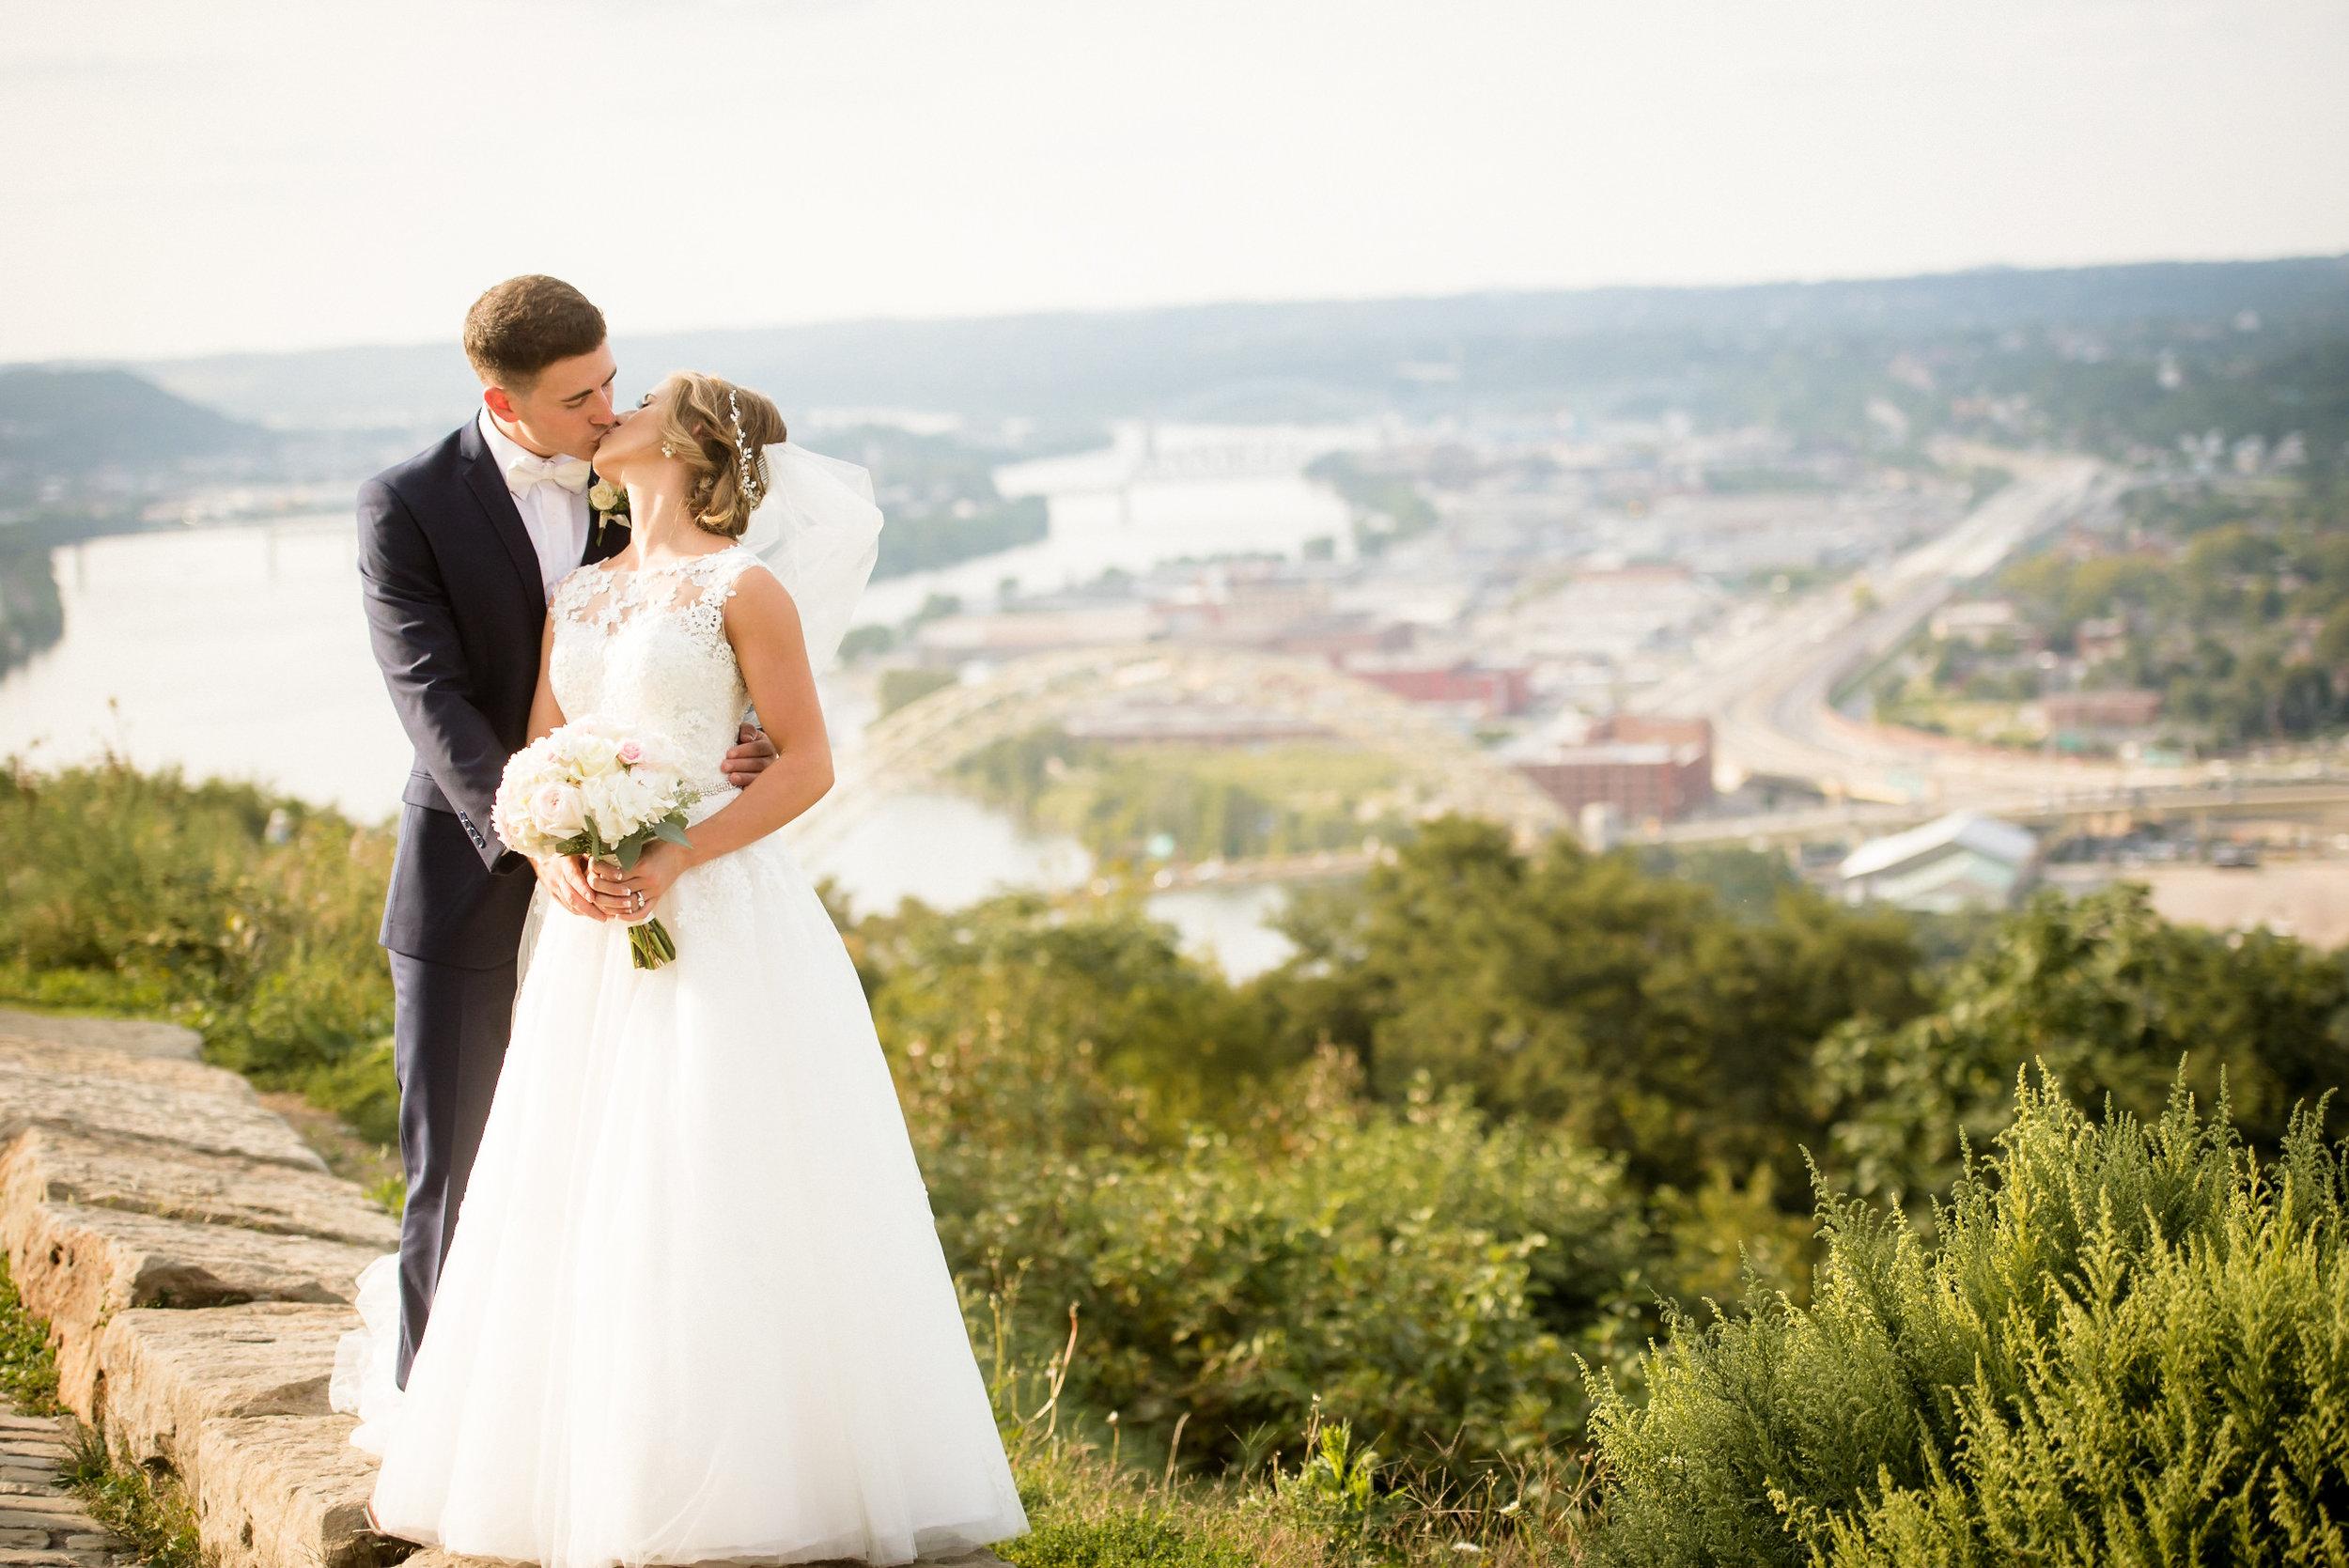 Mt Washington Wedding Engagement Picture Locations-5.jpg